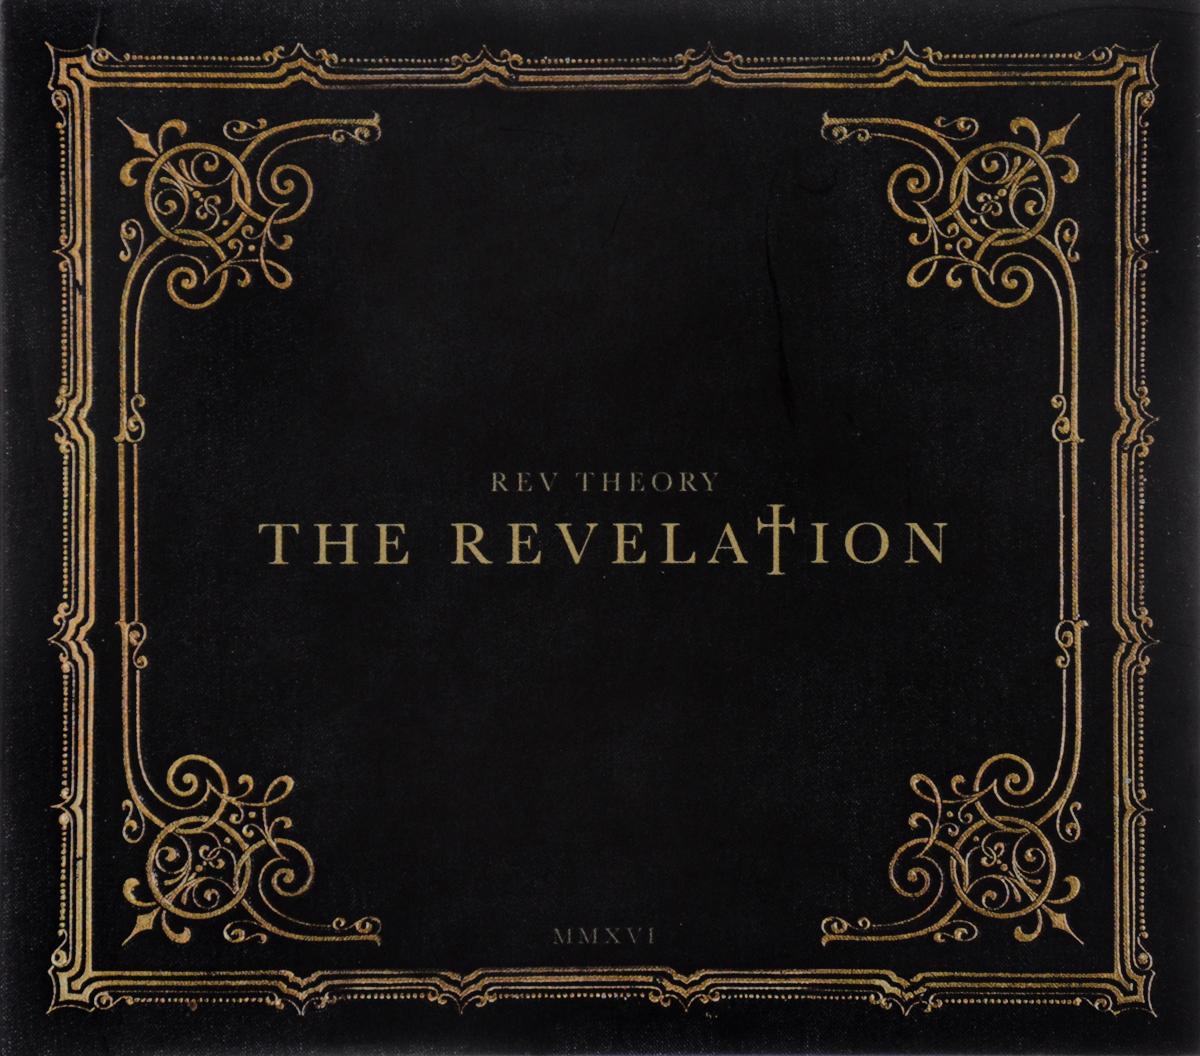 Rev Theory Rev Theory. The Revelation. Limited Edition n140hce en1 rev c2 rev c1 rev c4 rev b3 ips 72